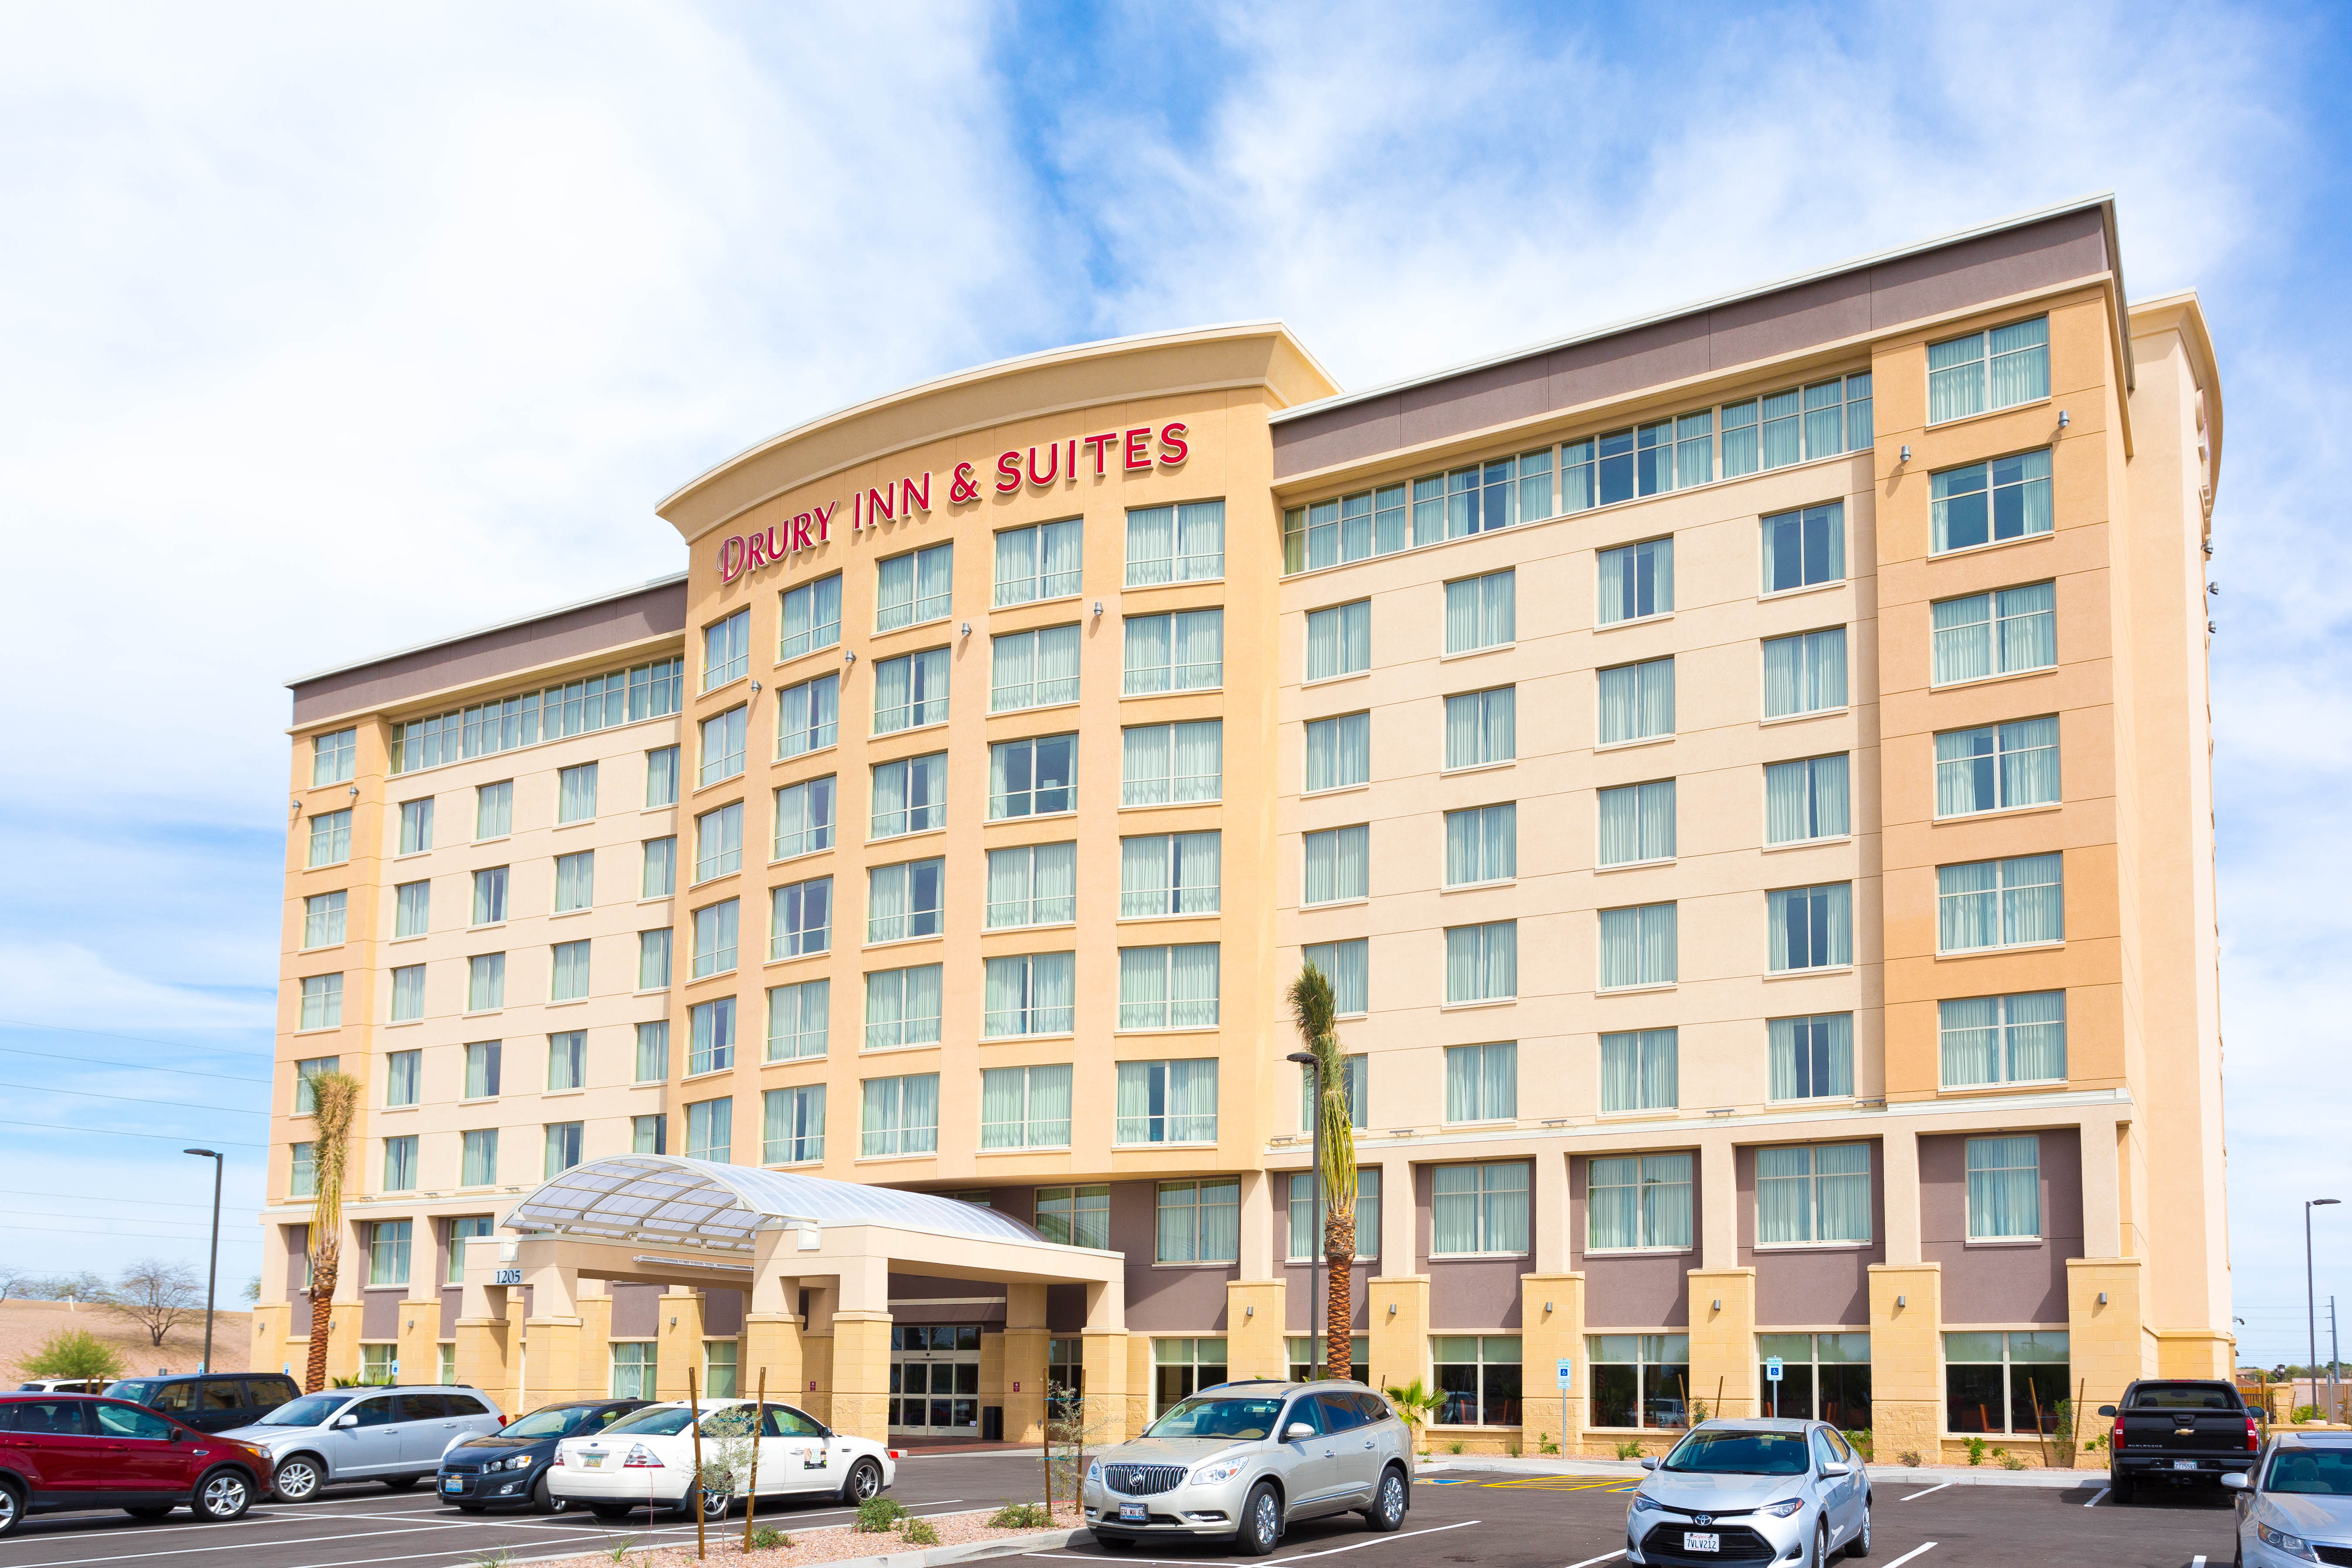 FAY: Christian dating phoenix az airport hotels